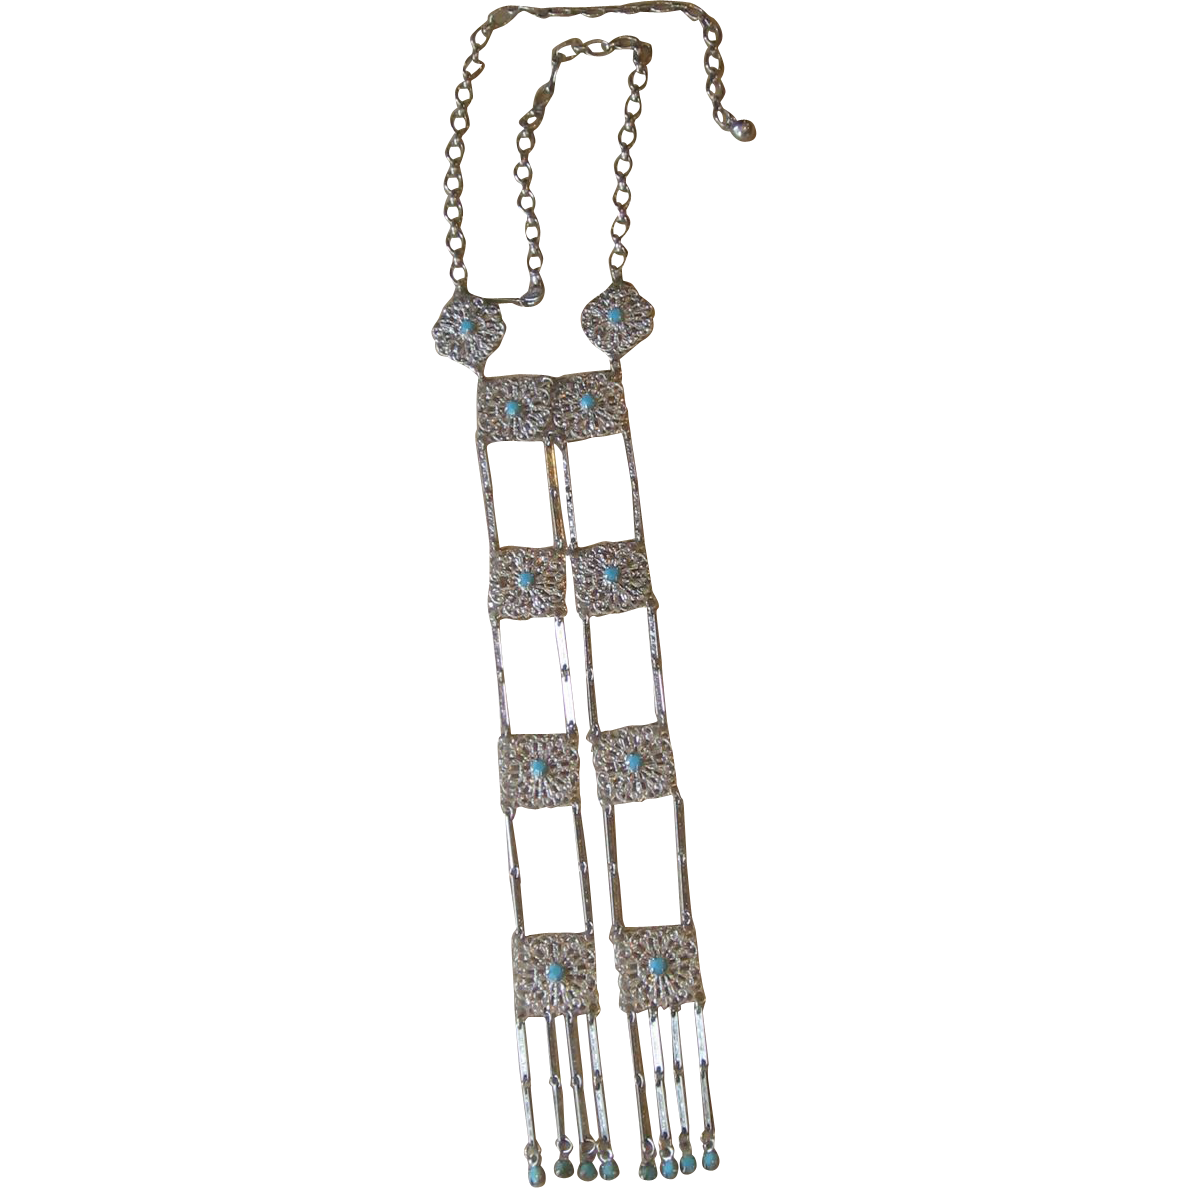 CELEBRITY-Massive Runway Necklace